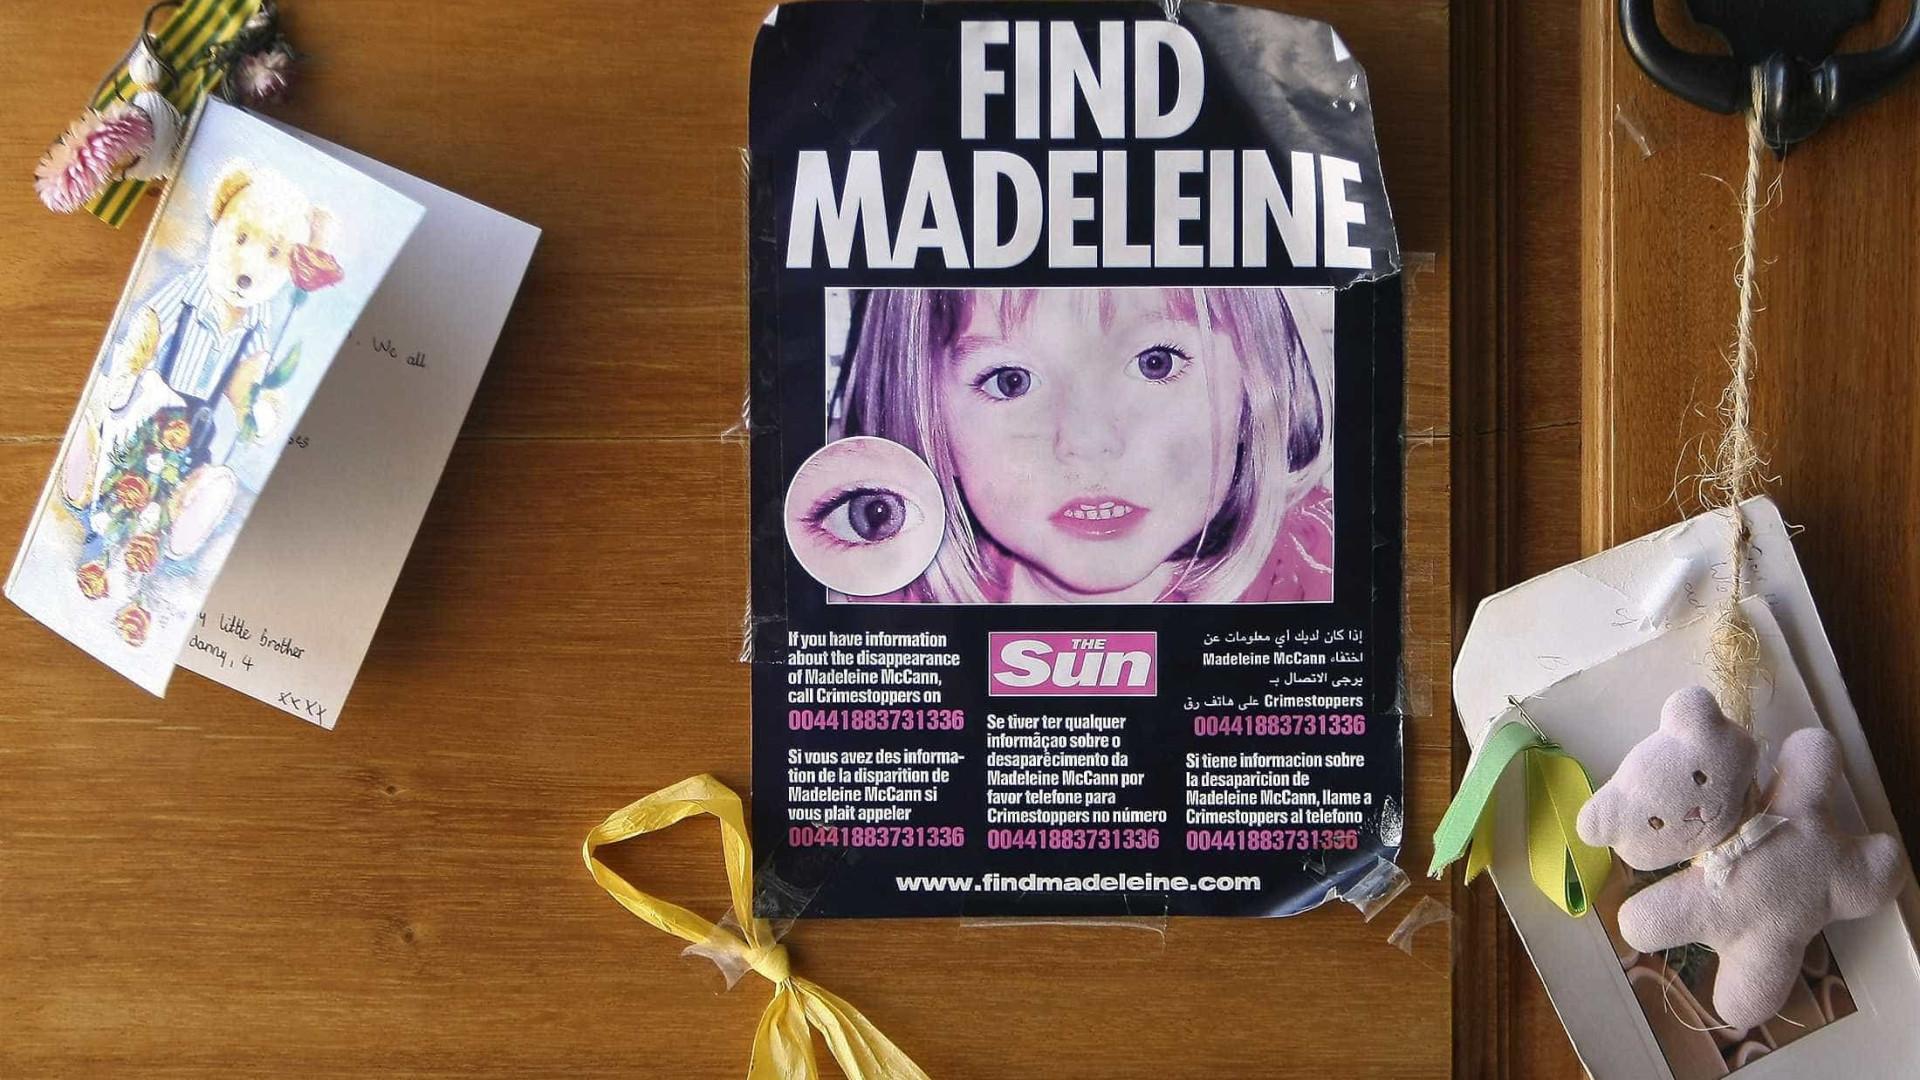 Motorista de hotel algarvio procurado 'a reboque' do caso Maddie